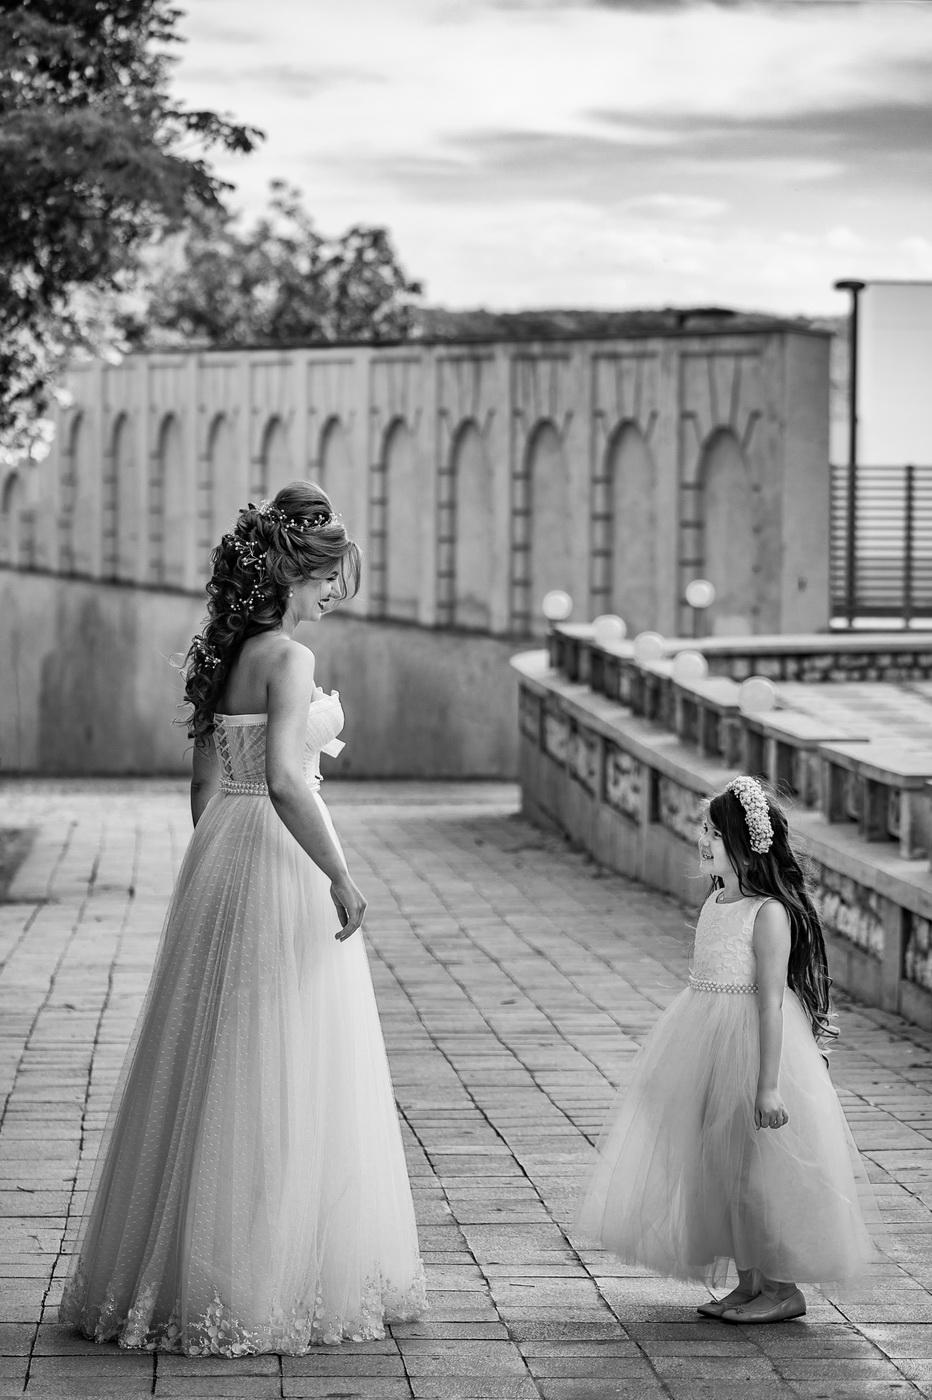 Destination Wedding Photographer_Marian Sterea_195.jpg